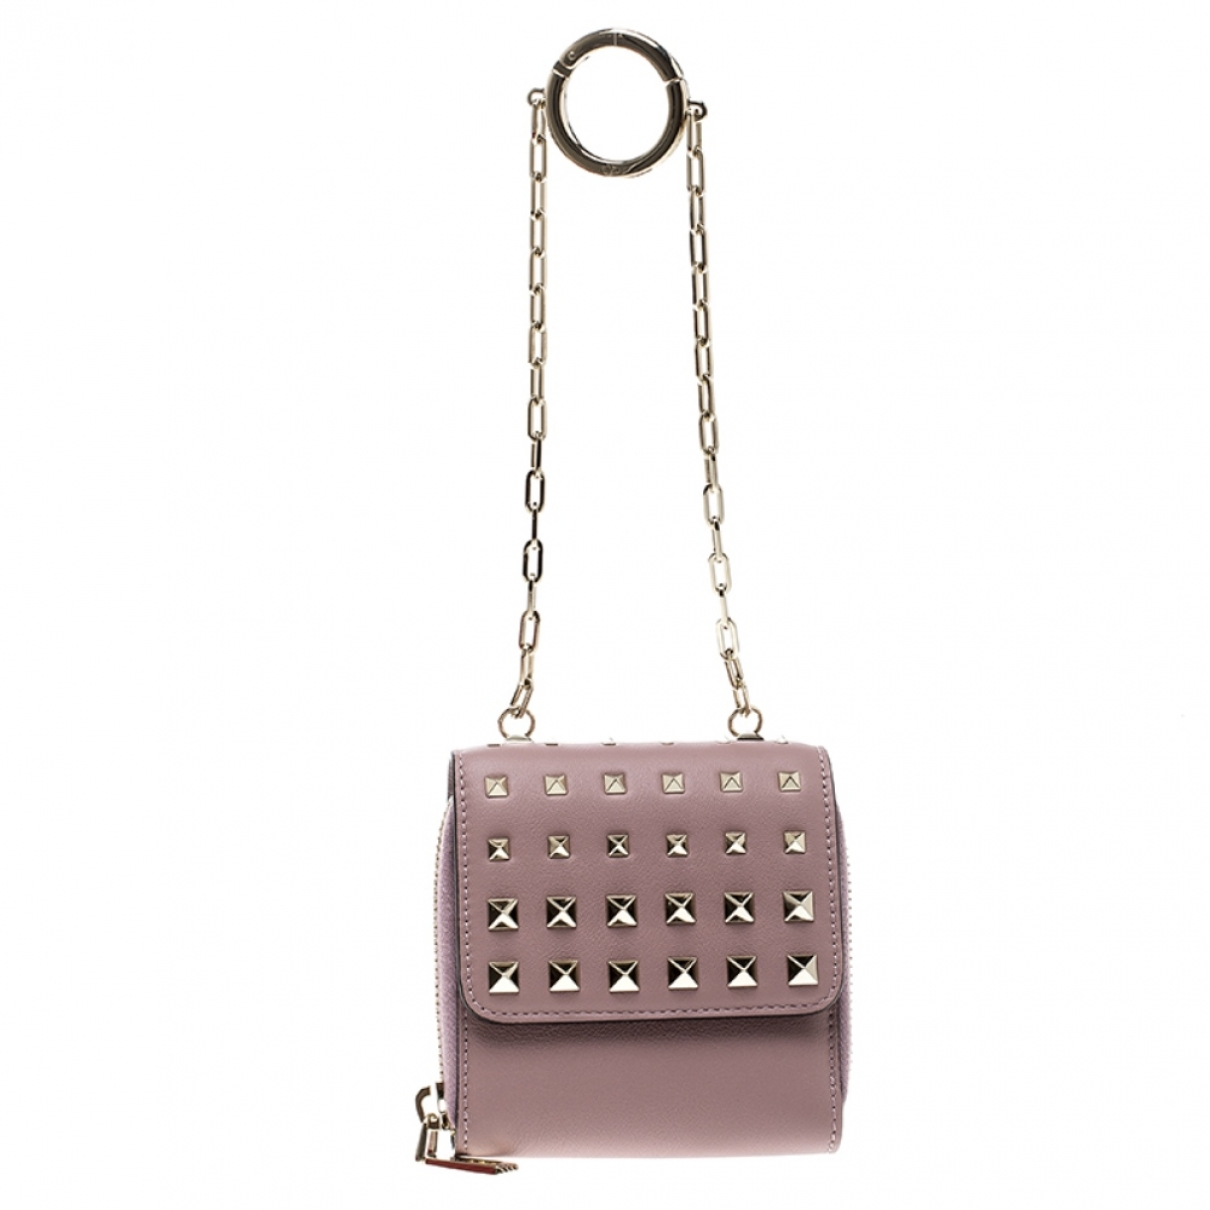 Valentino Garavani Rockstud Beige Leather Clutch bag for Women \N